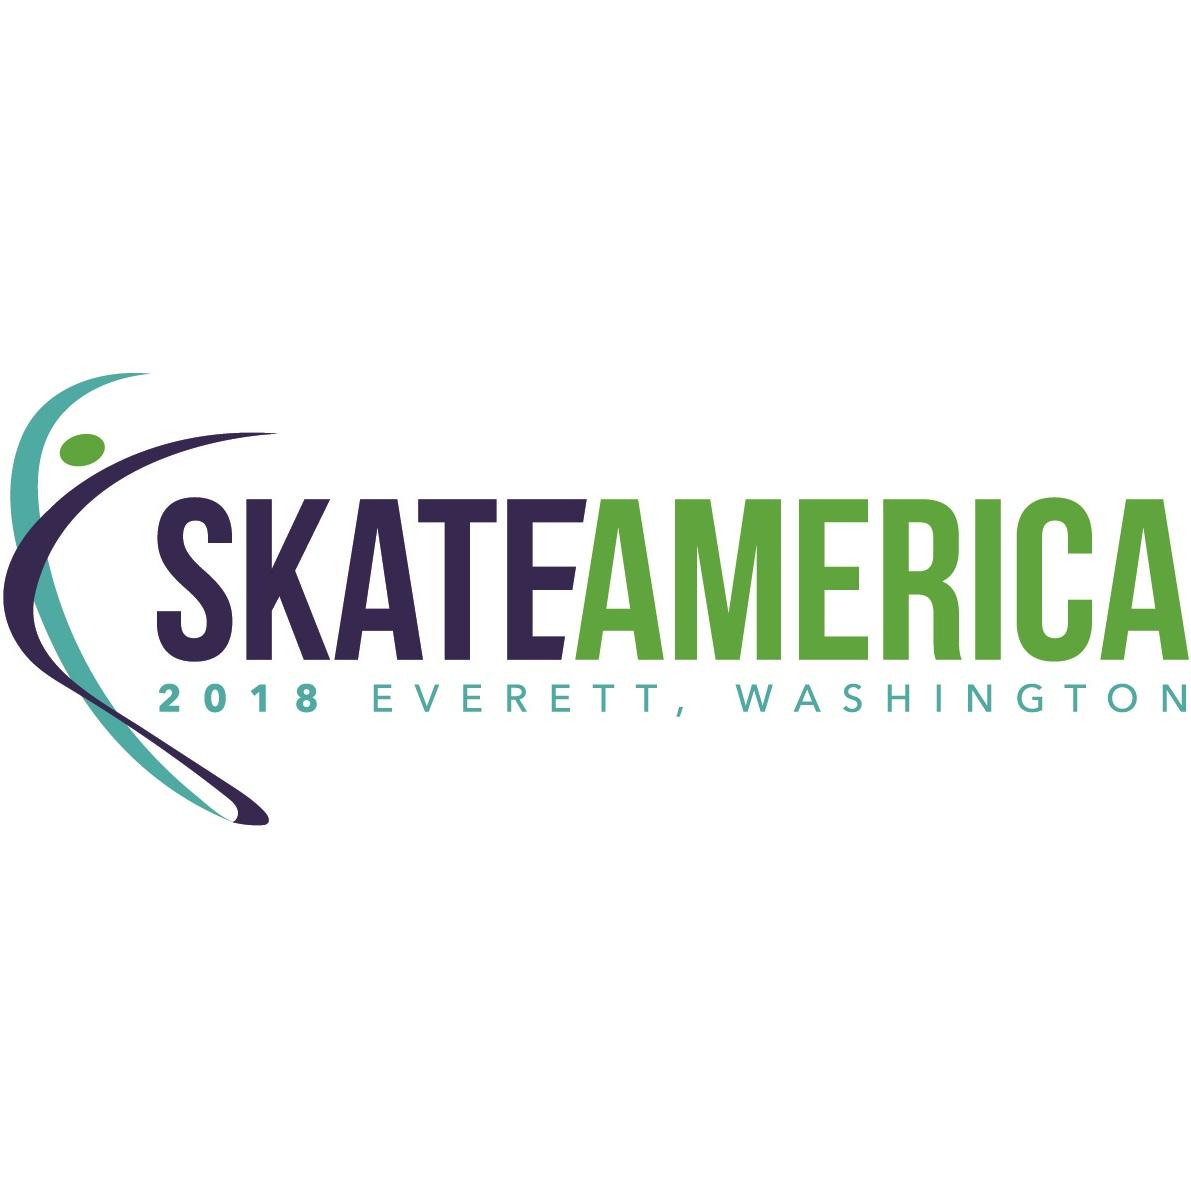 2018 ISU Grand Prix of Figure Skating - Skate America